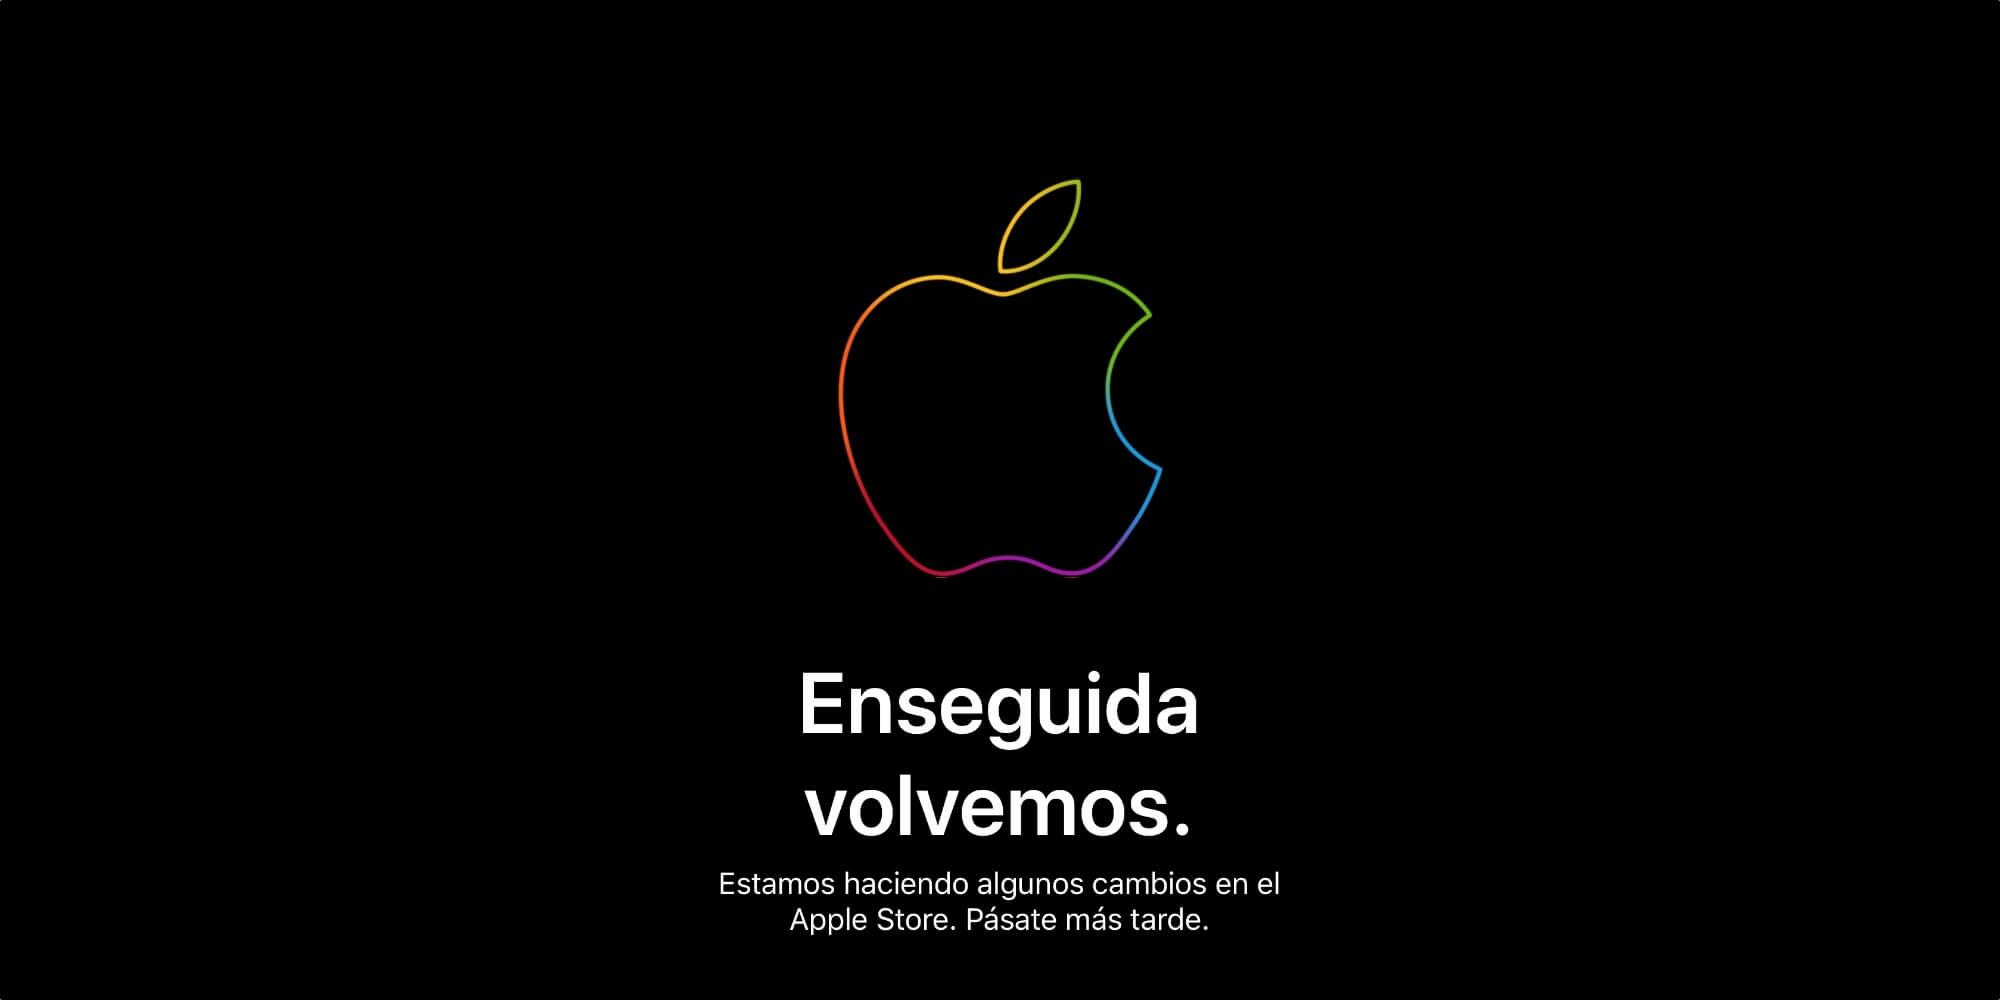 Enseguida volvemos - Apple Store